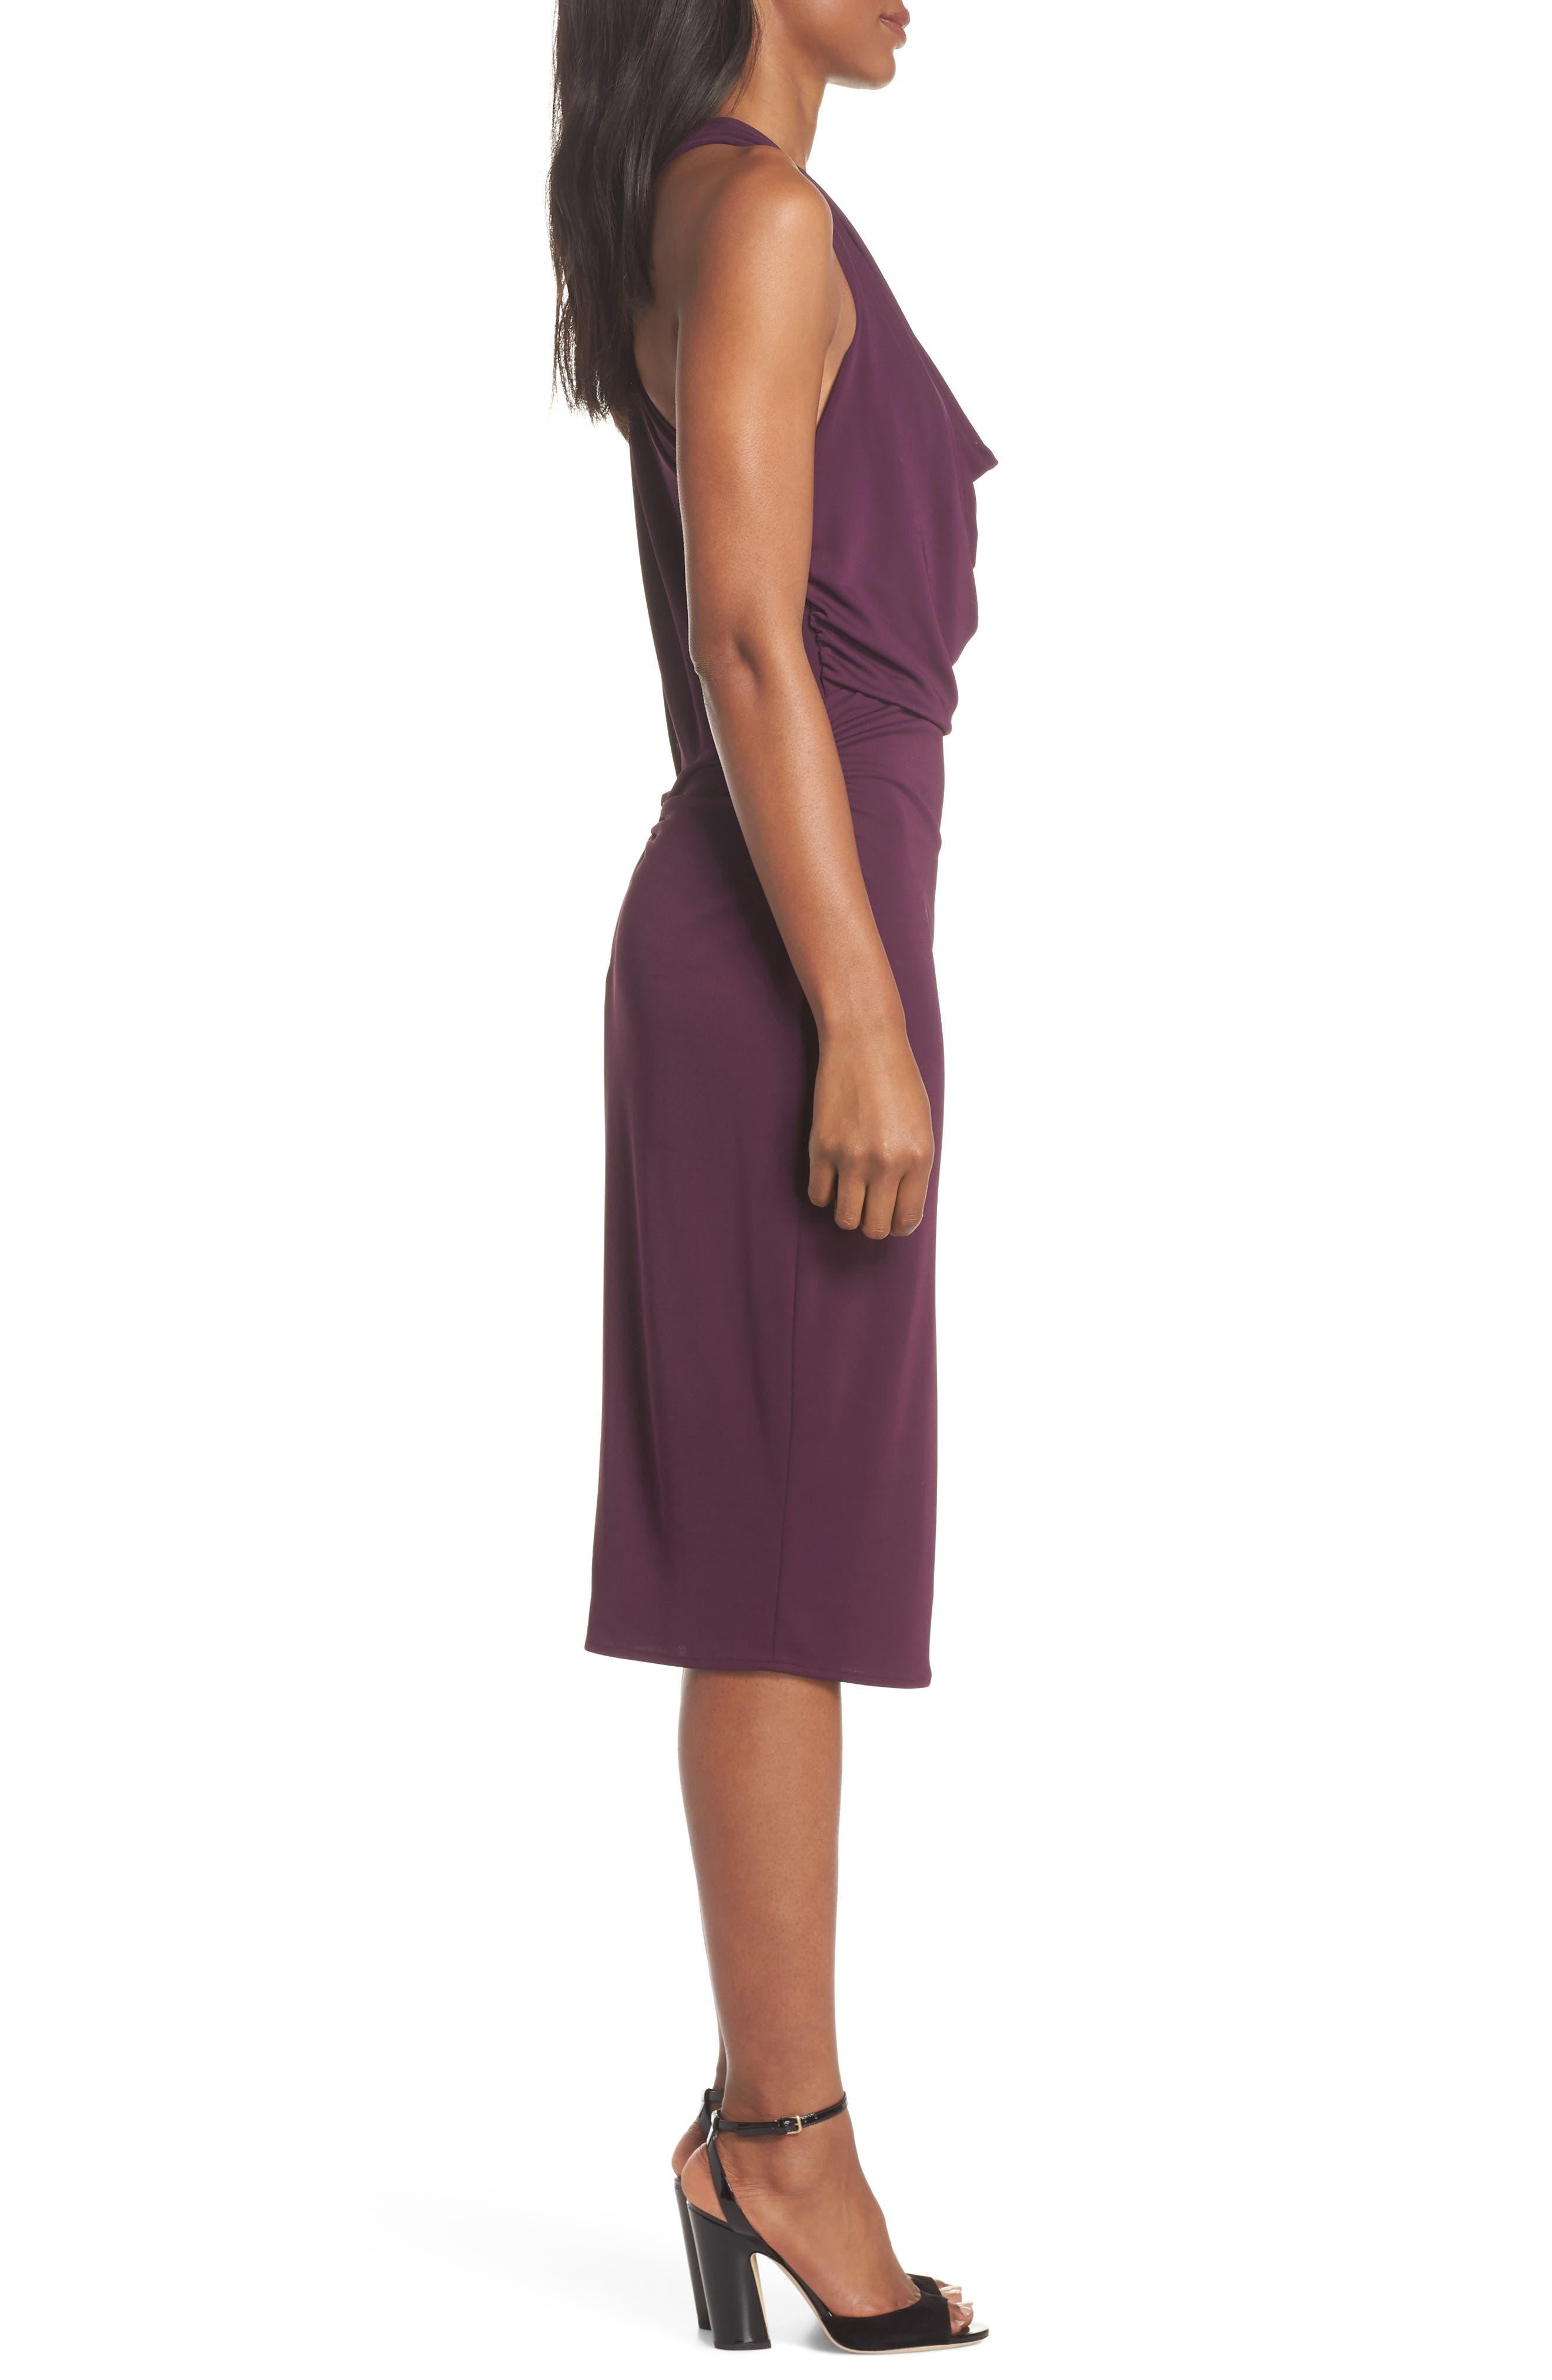 Elise Cowl Neck Sleeveless Dress,                             Alternate thumbnail 3, color,                             Wine